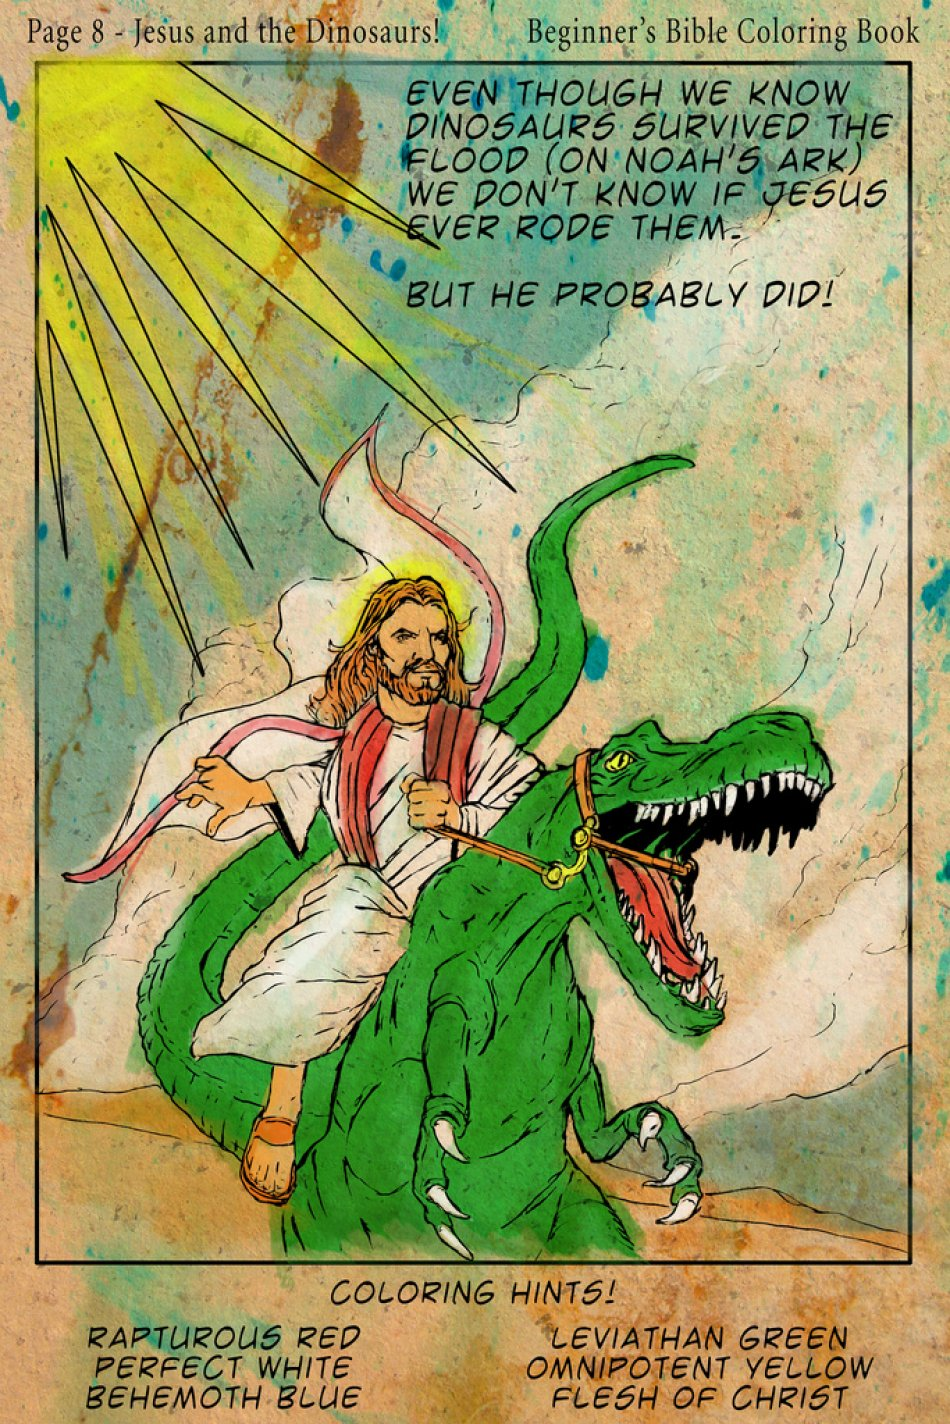 Did Jesus Ride On A Dinosaur